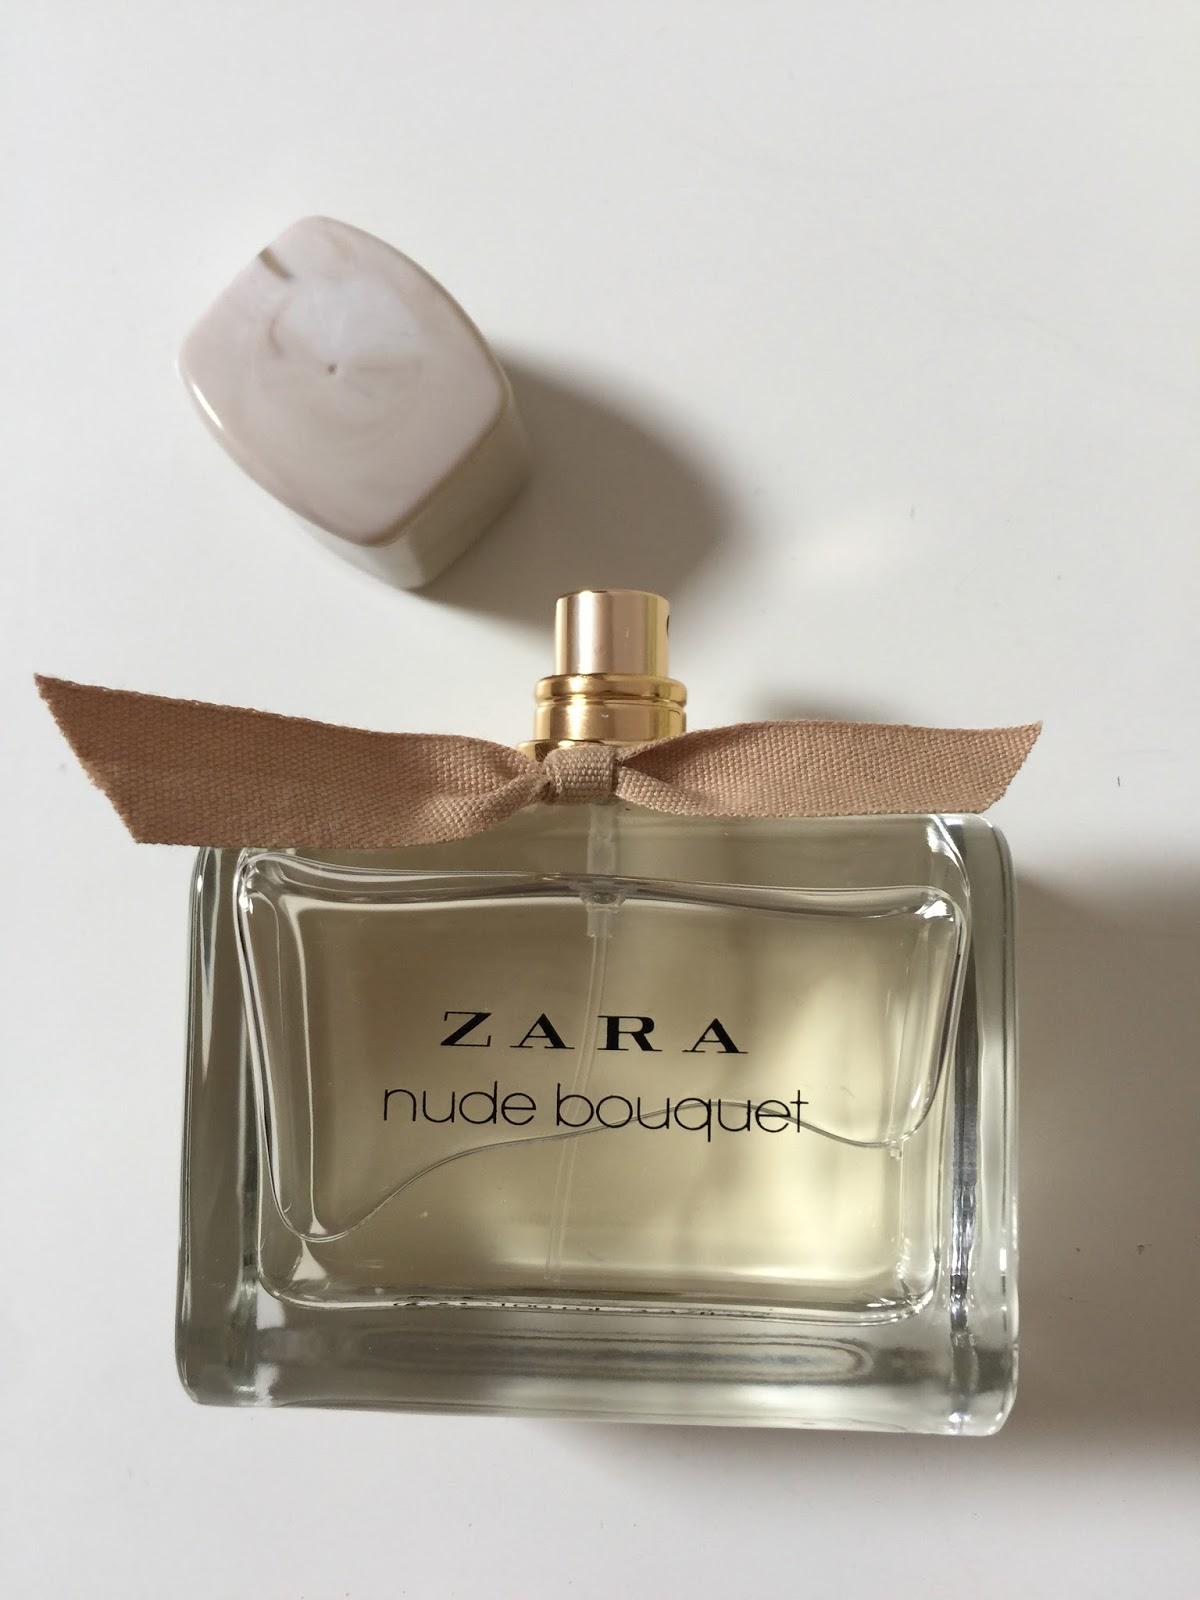 Zara Nude Bouquet Edp 100 Ml, en ucuz Zara Nude Bouquet